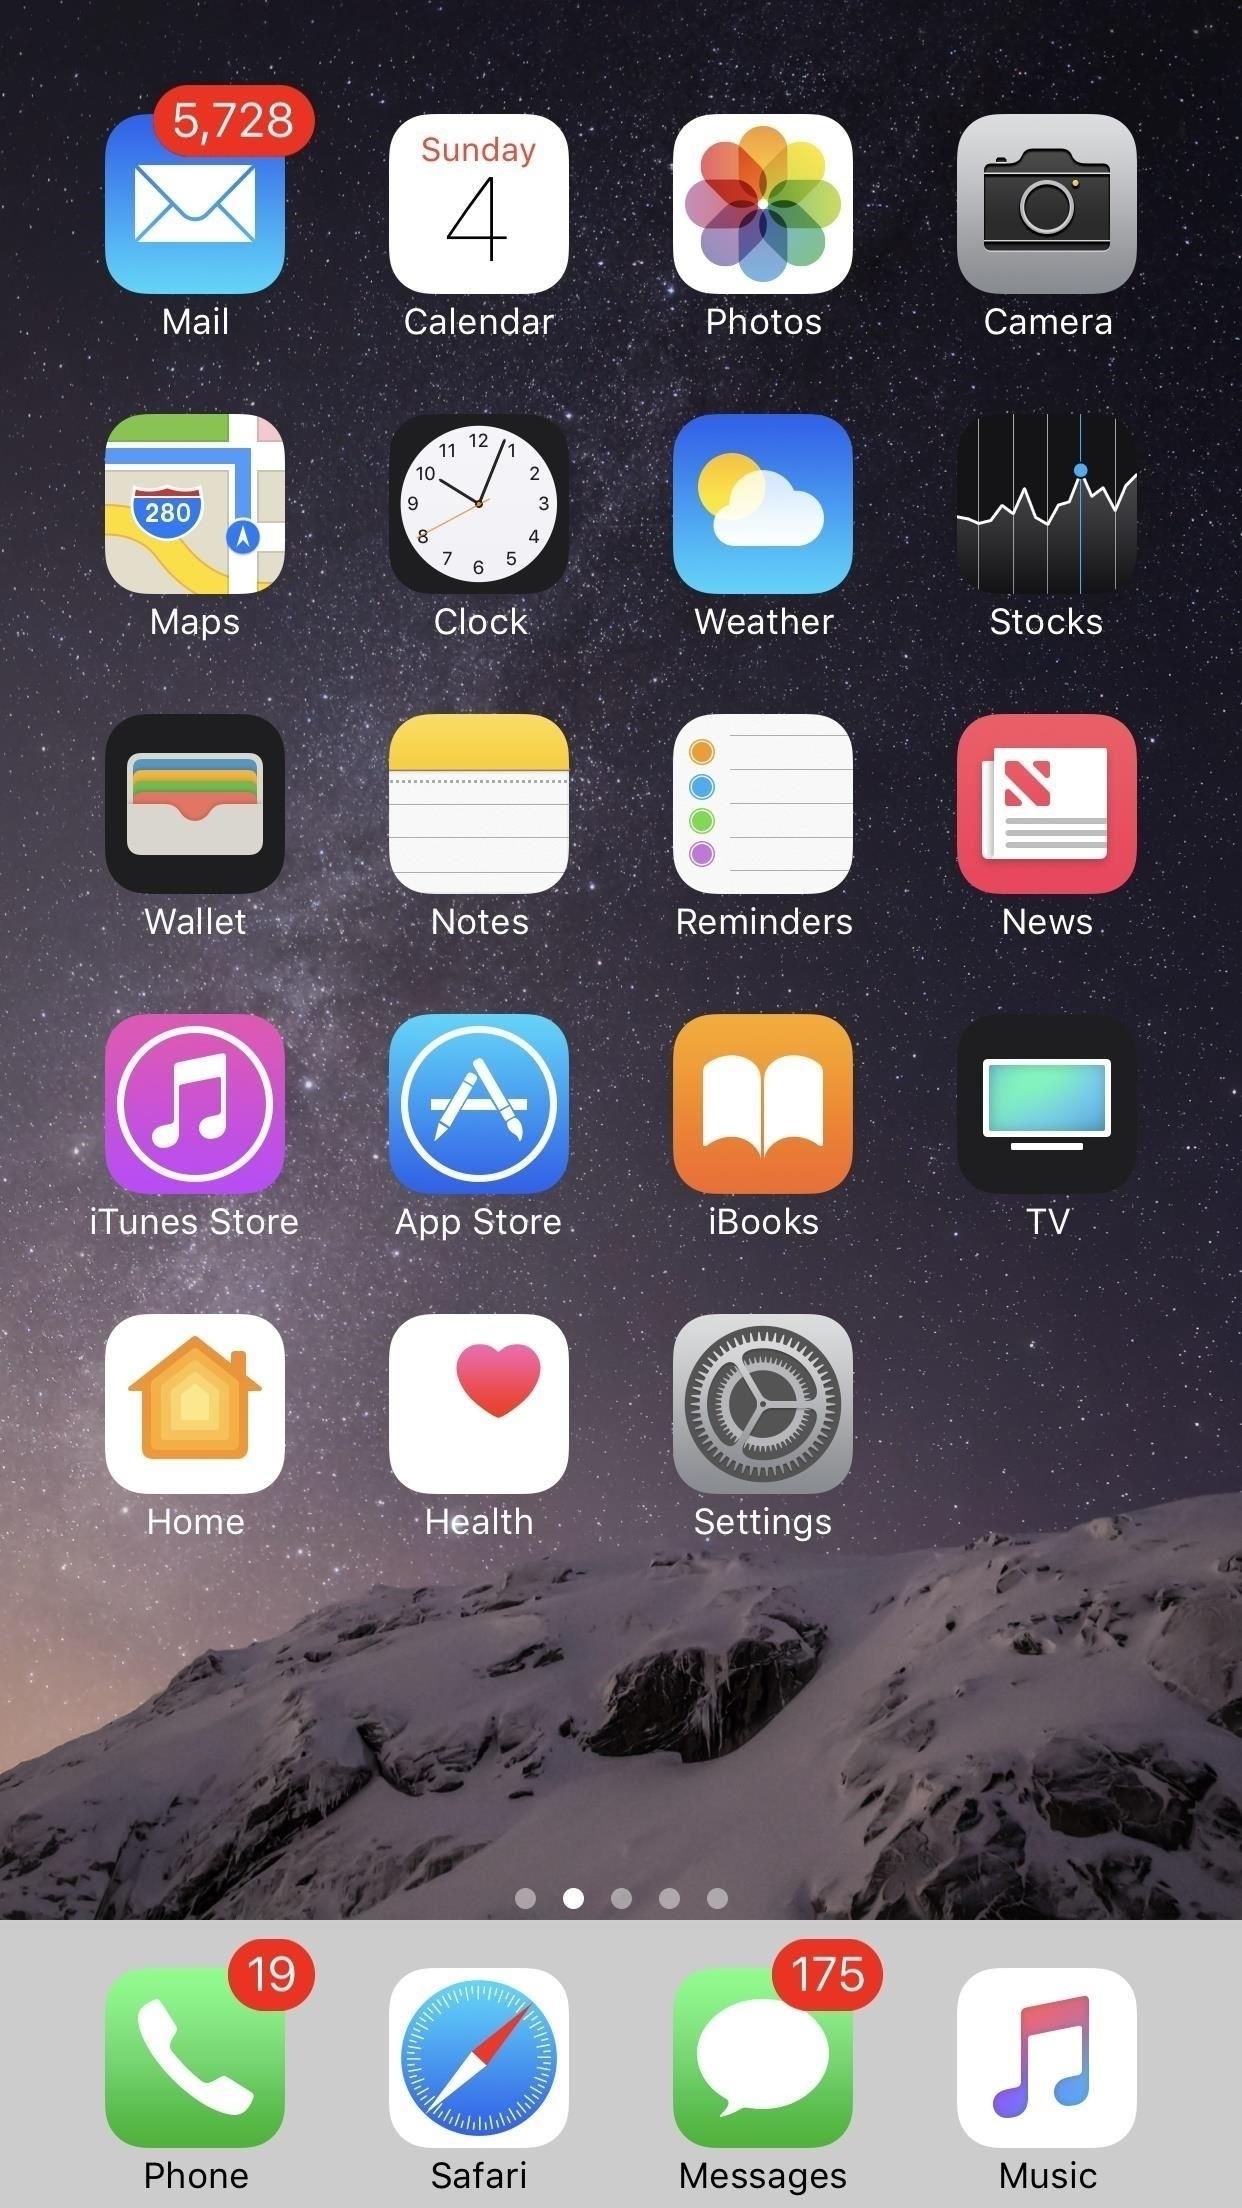 Iphone 5 Calendar Icon Missing • Printable Blank Calendar